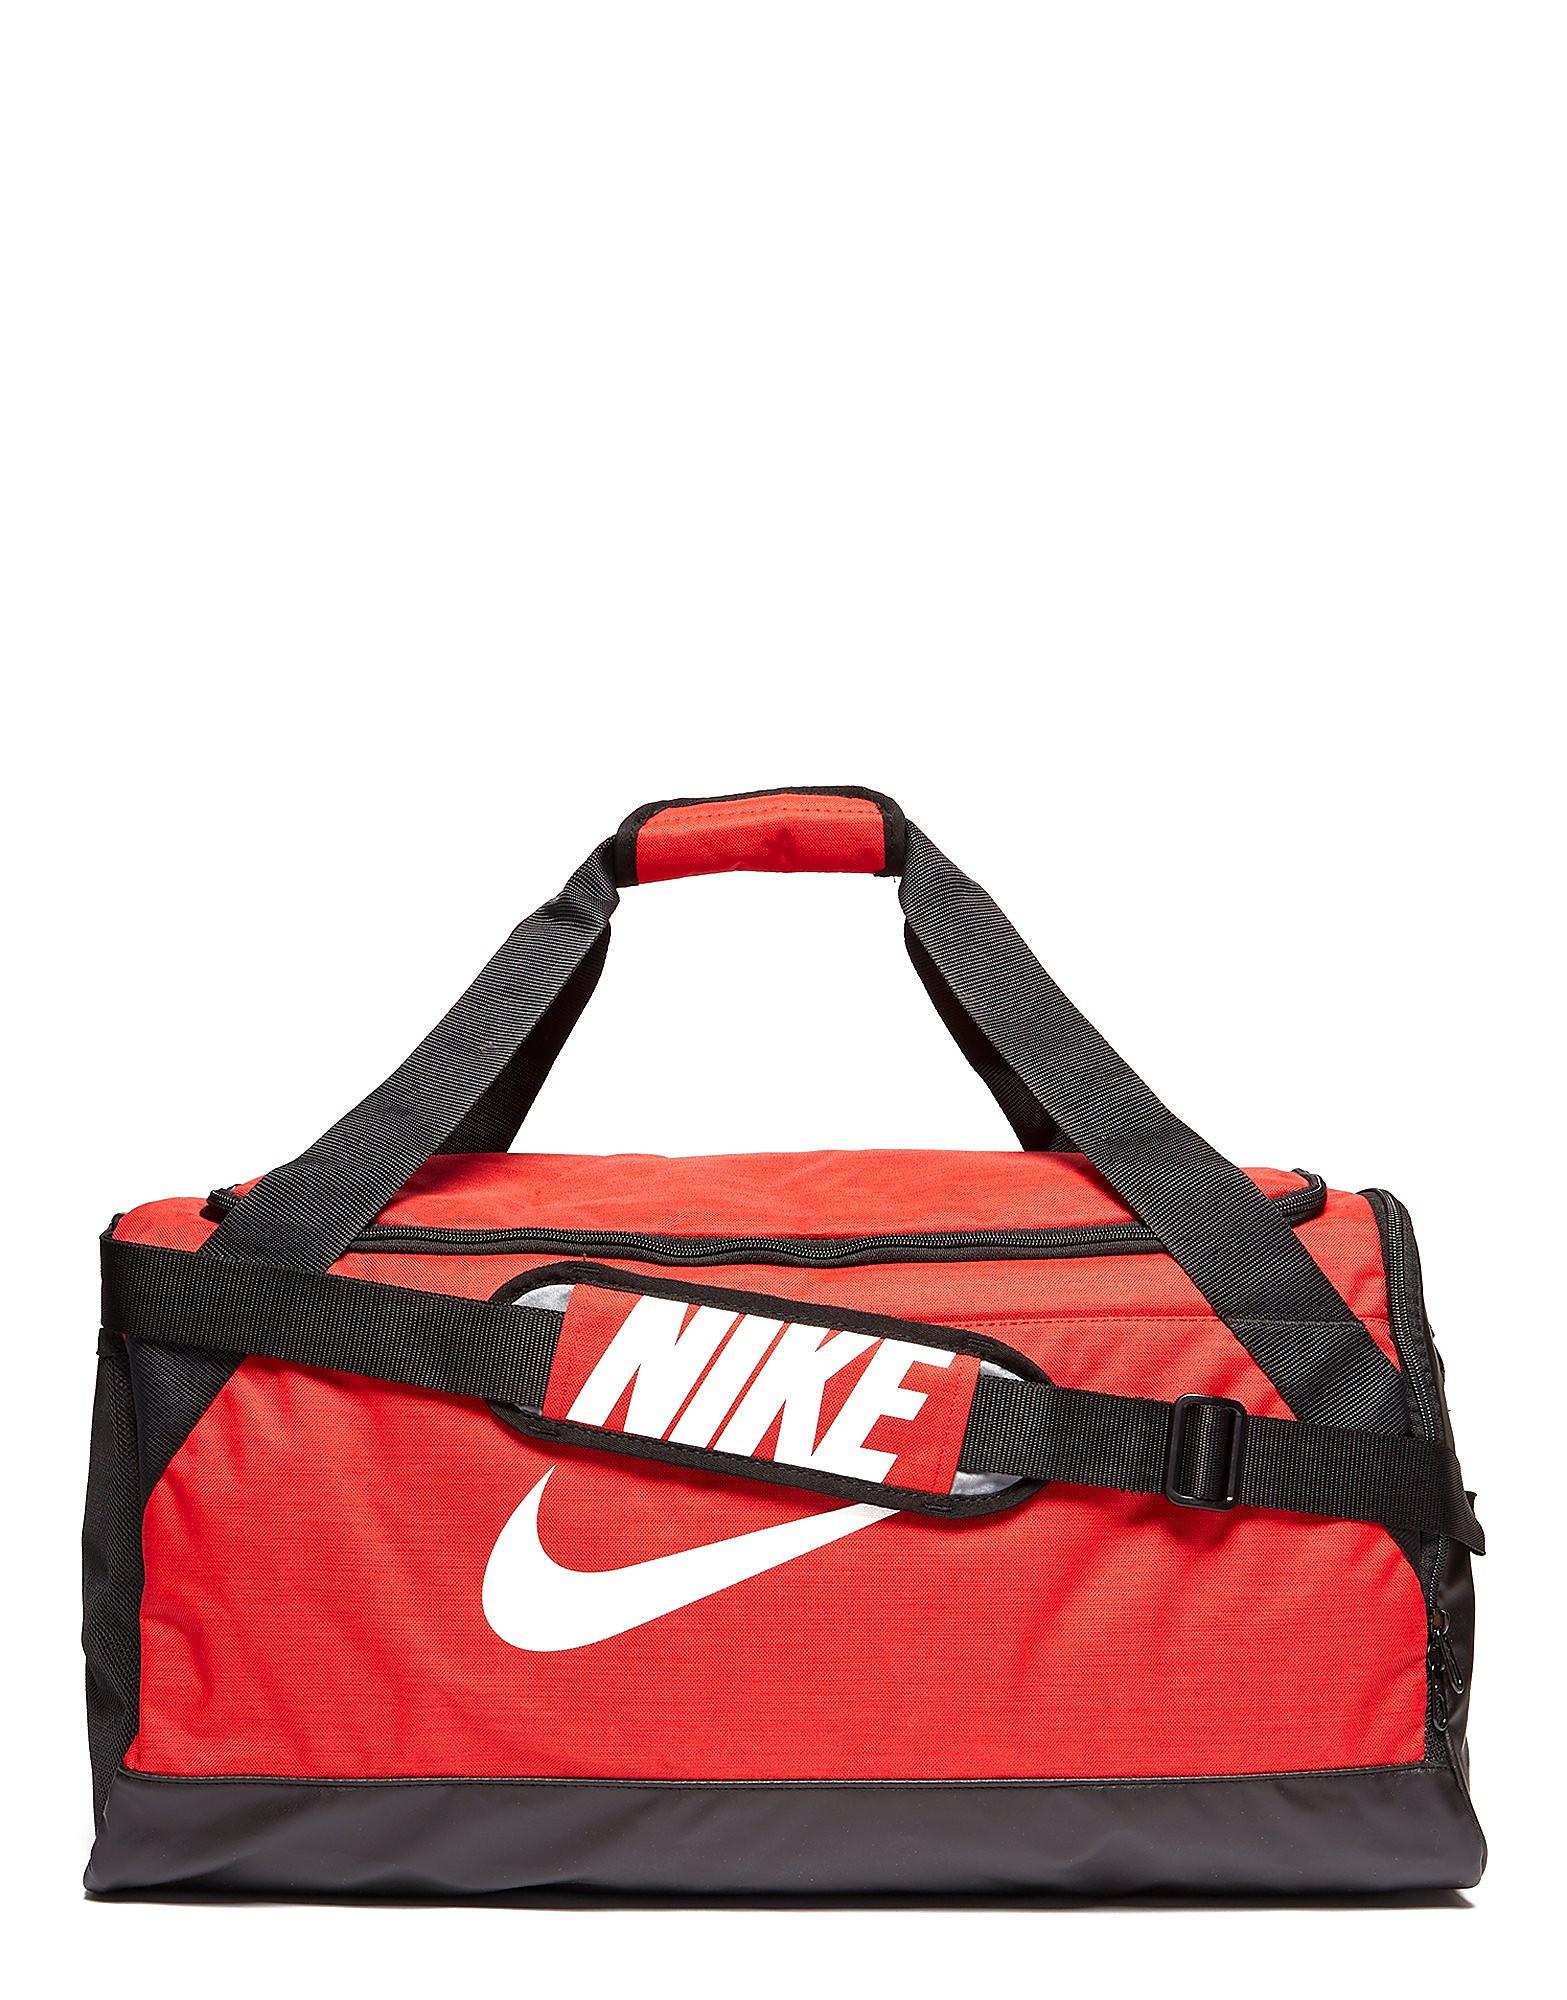 Nike bolsa de deporte Medium Brasilia